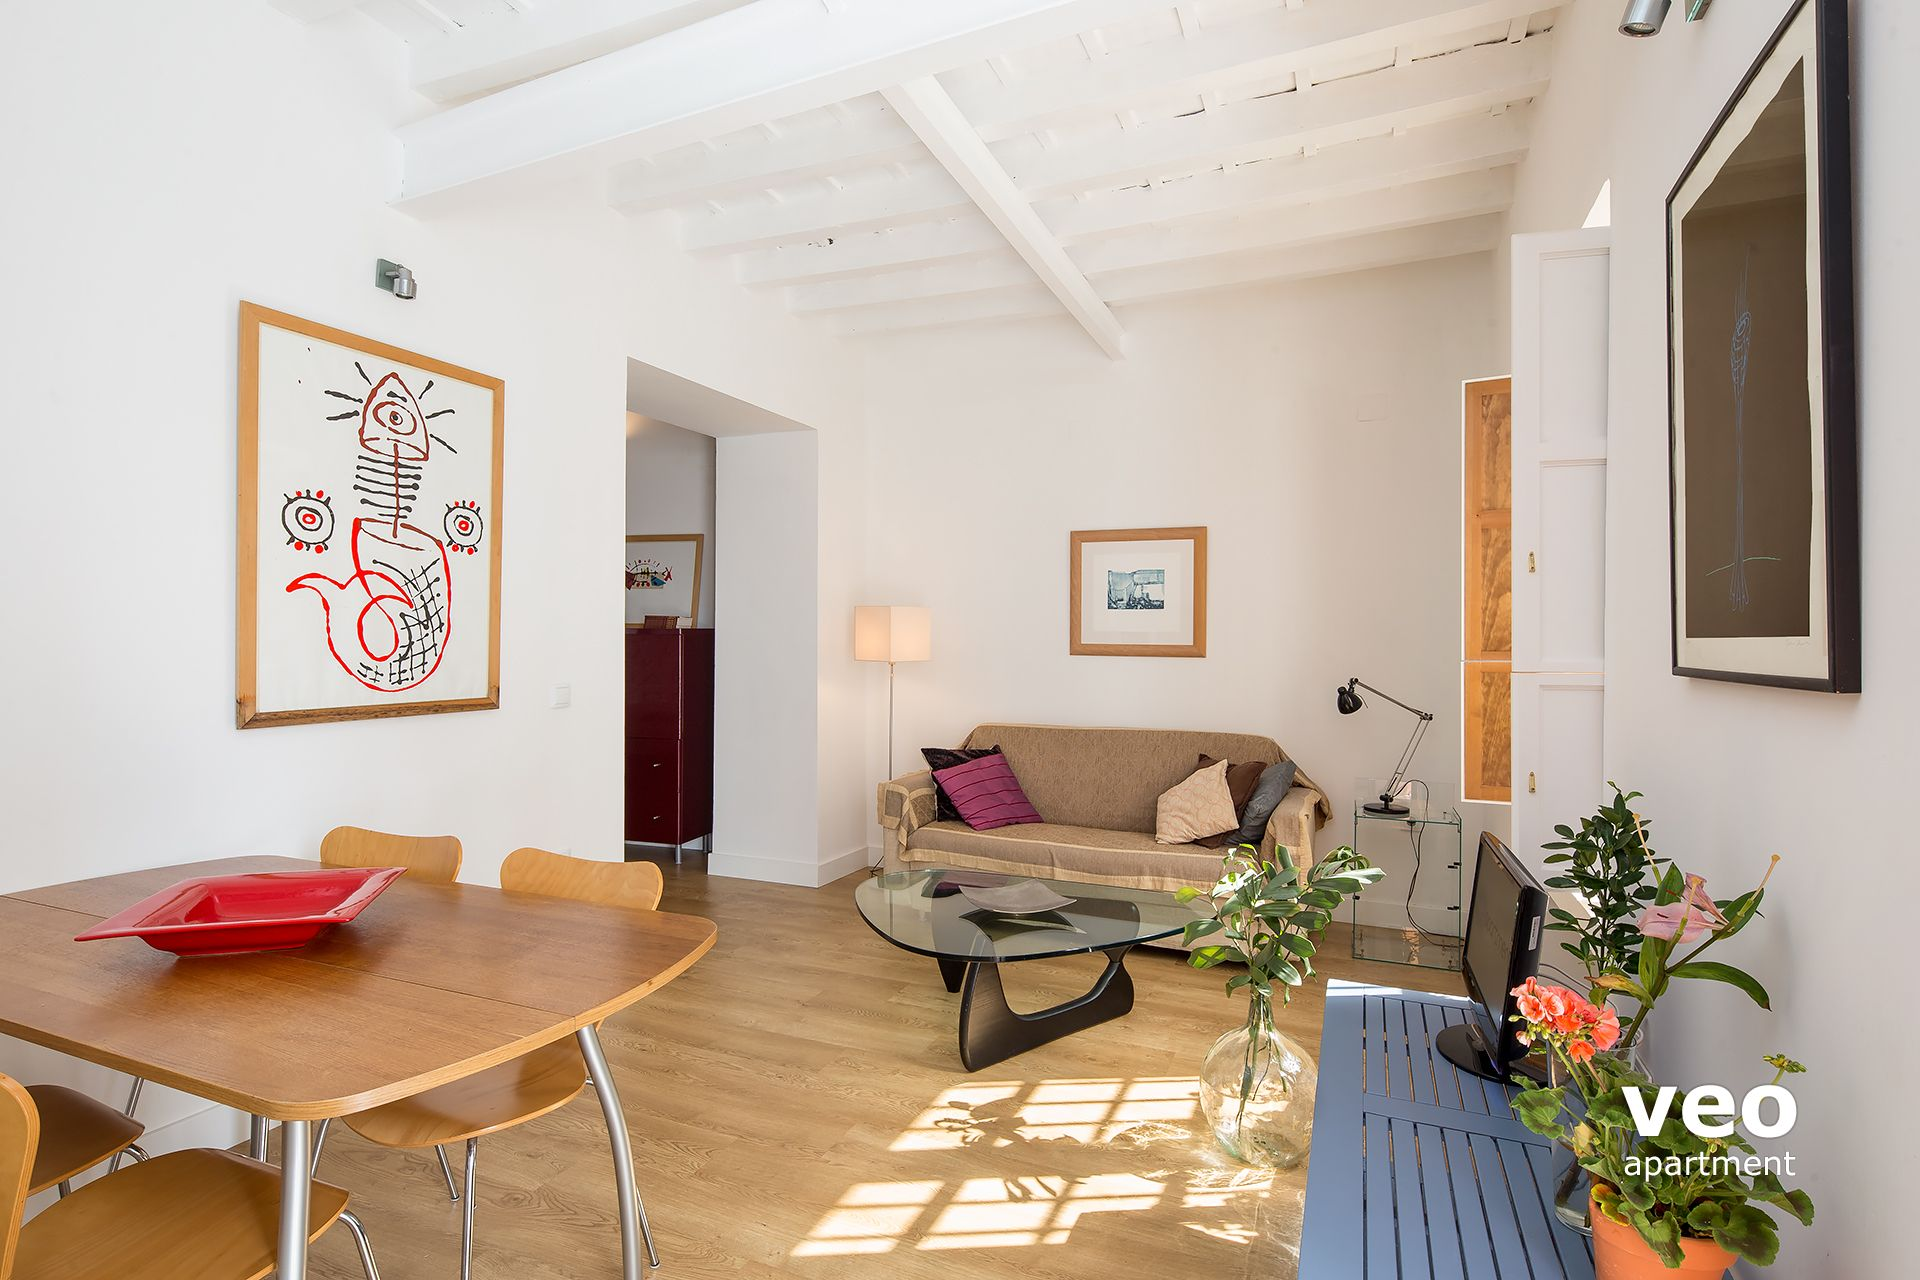 Appartement Rue Jes 250 S Del Gran Poder S 233 Ville Espagne